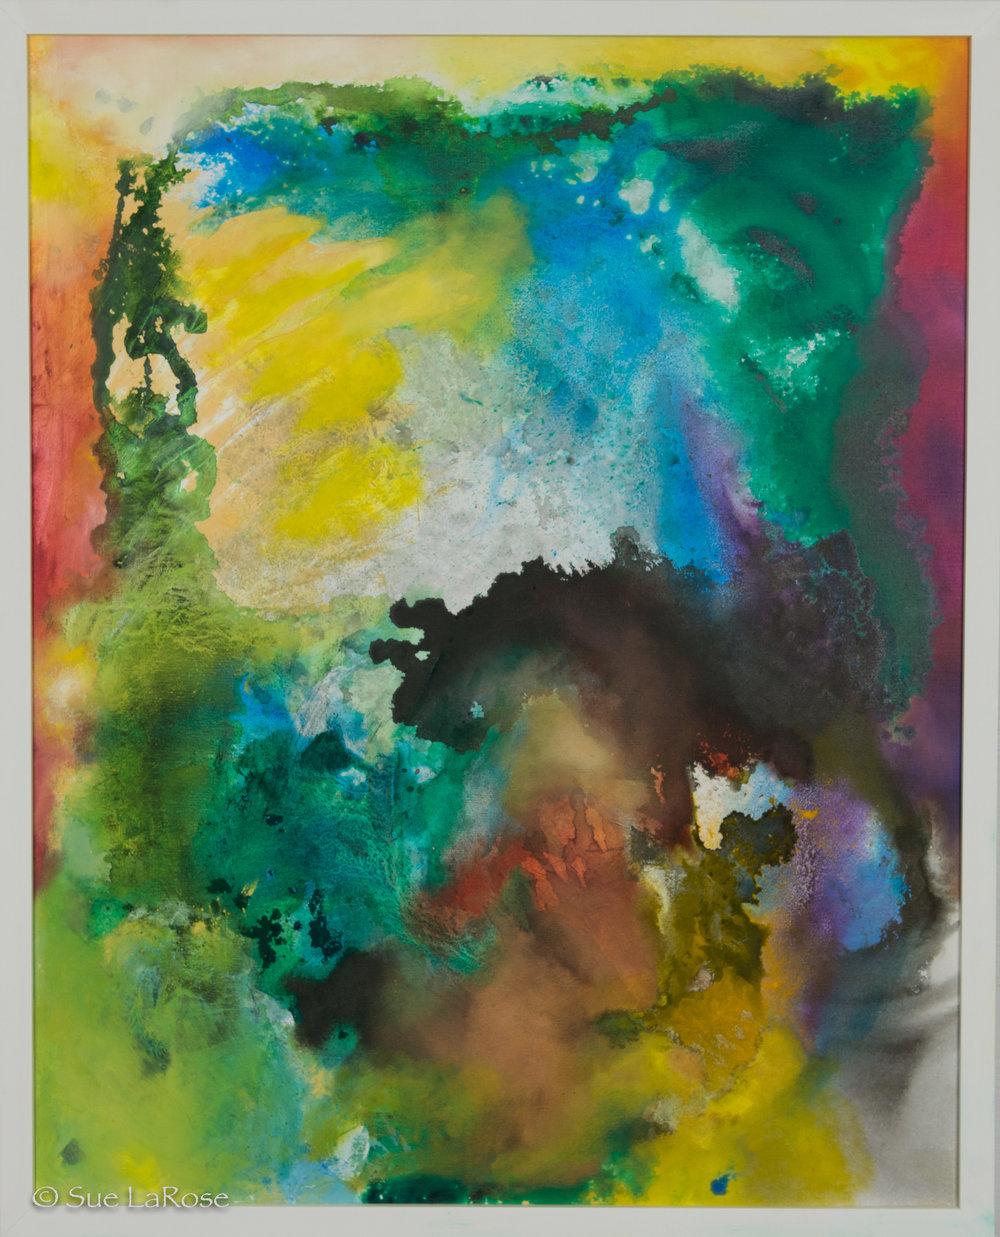 THE STARS BEGAN TO BURN, 25x31, mixed mediaby Heather Schwartz -